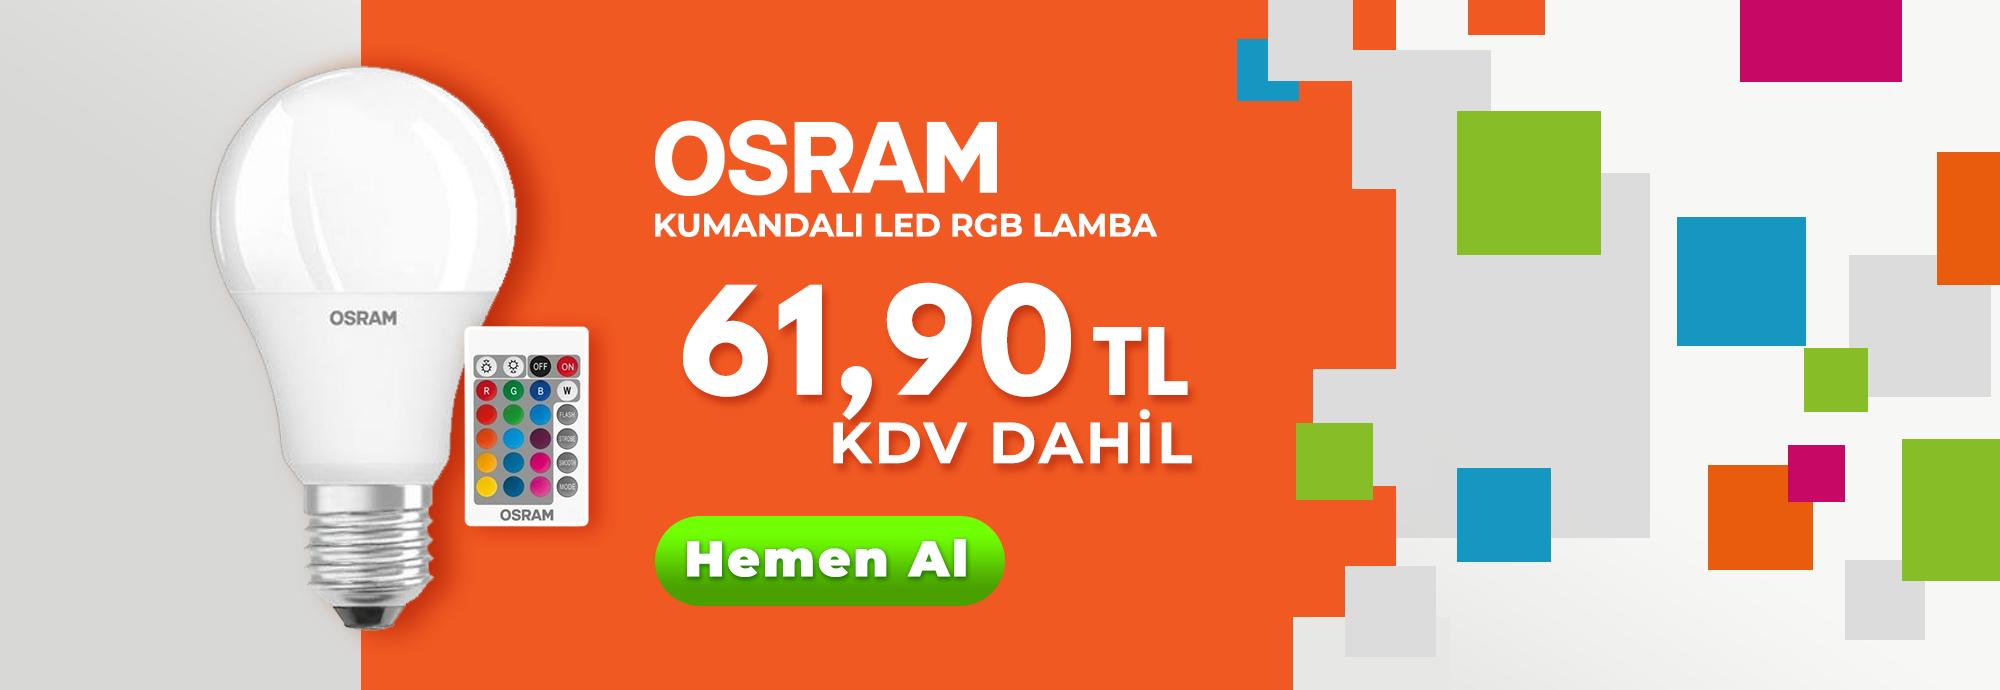 Osram Kumandalı Led RGB Lamba